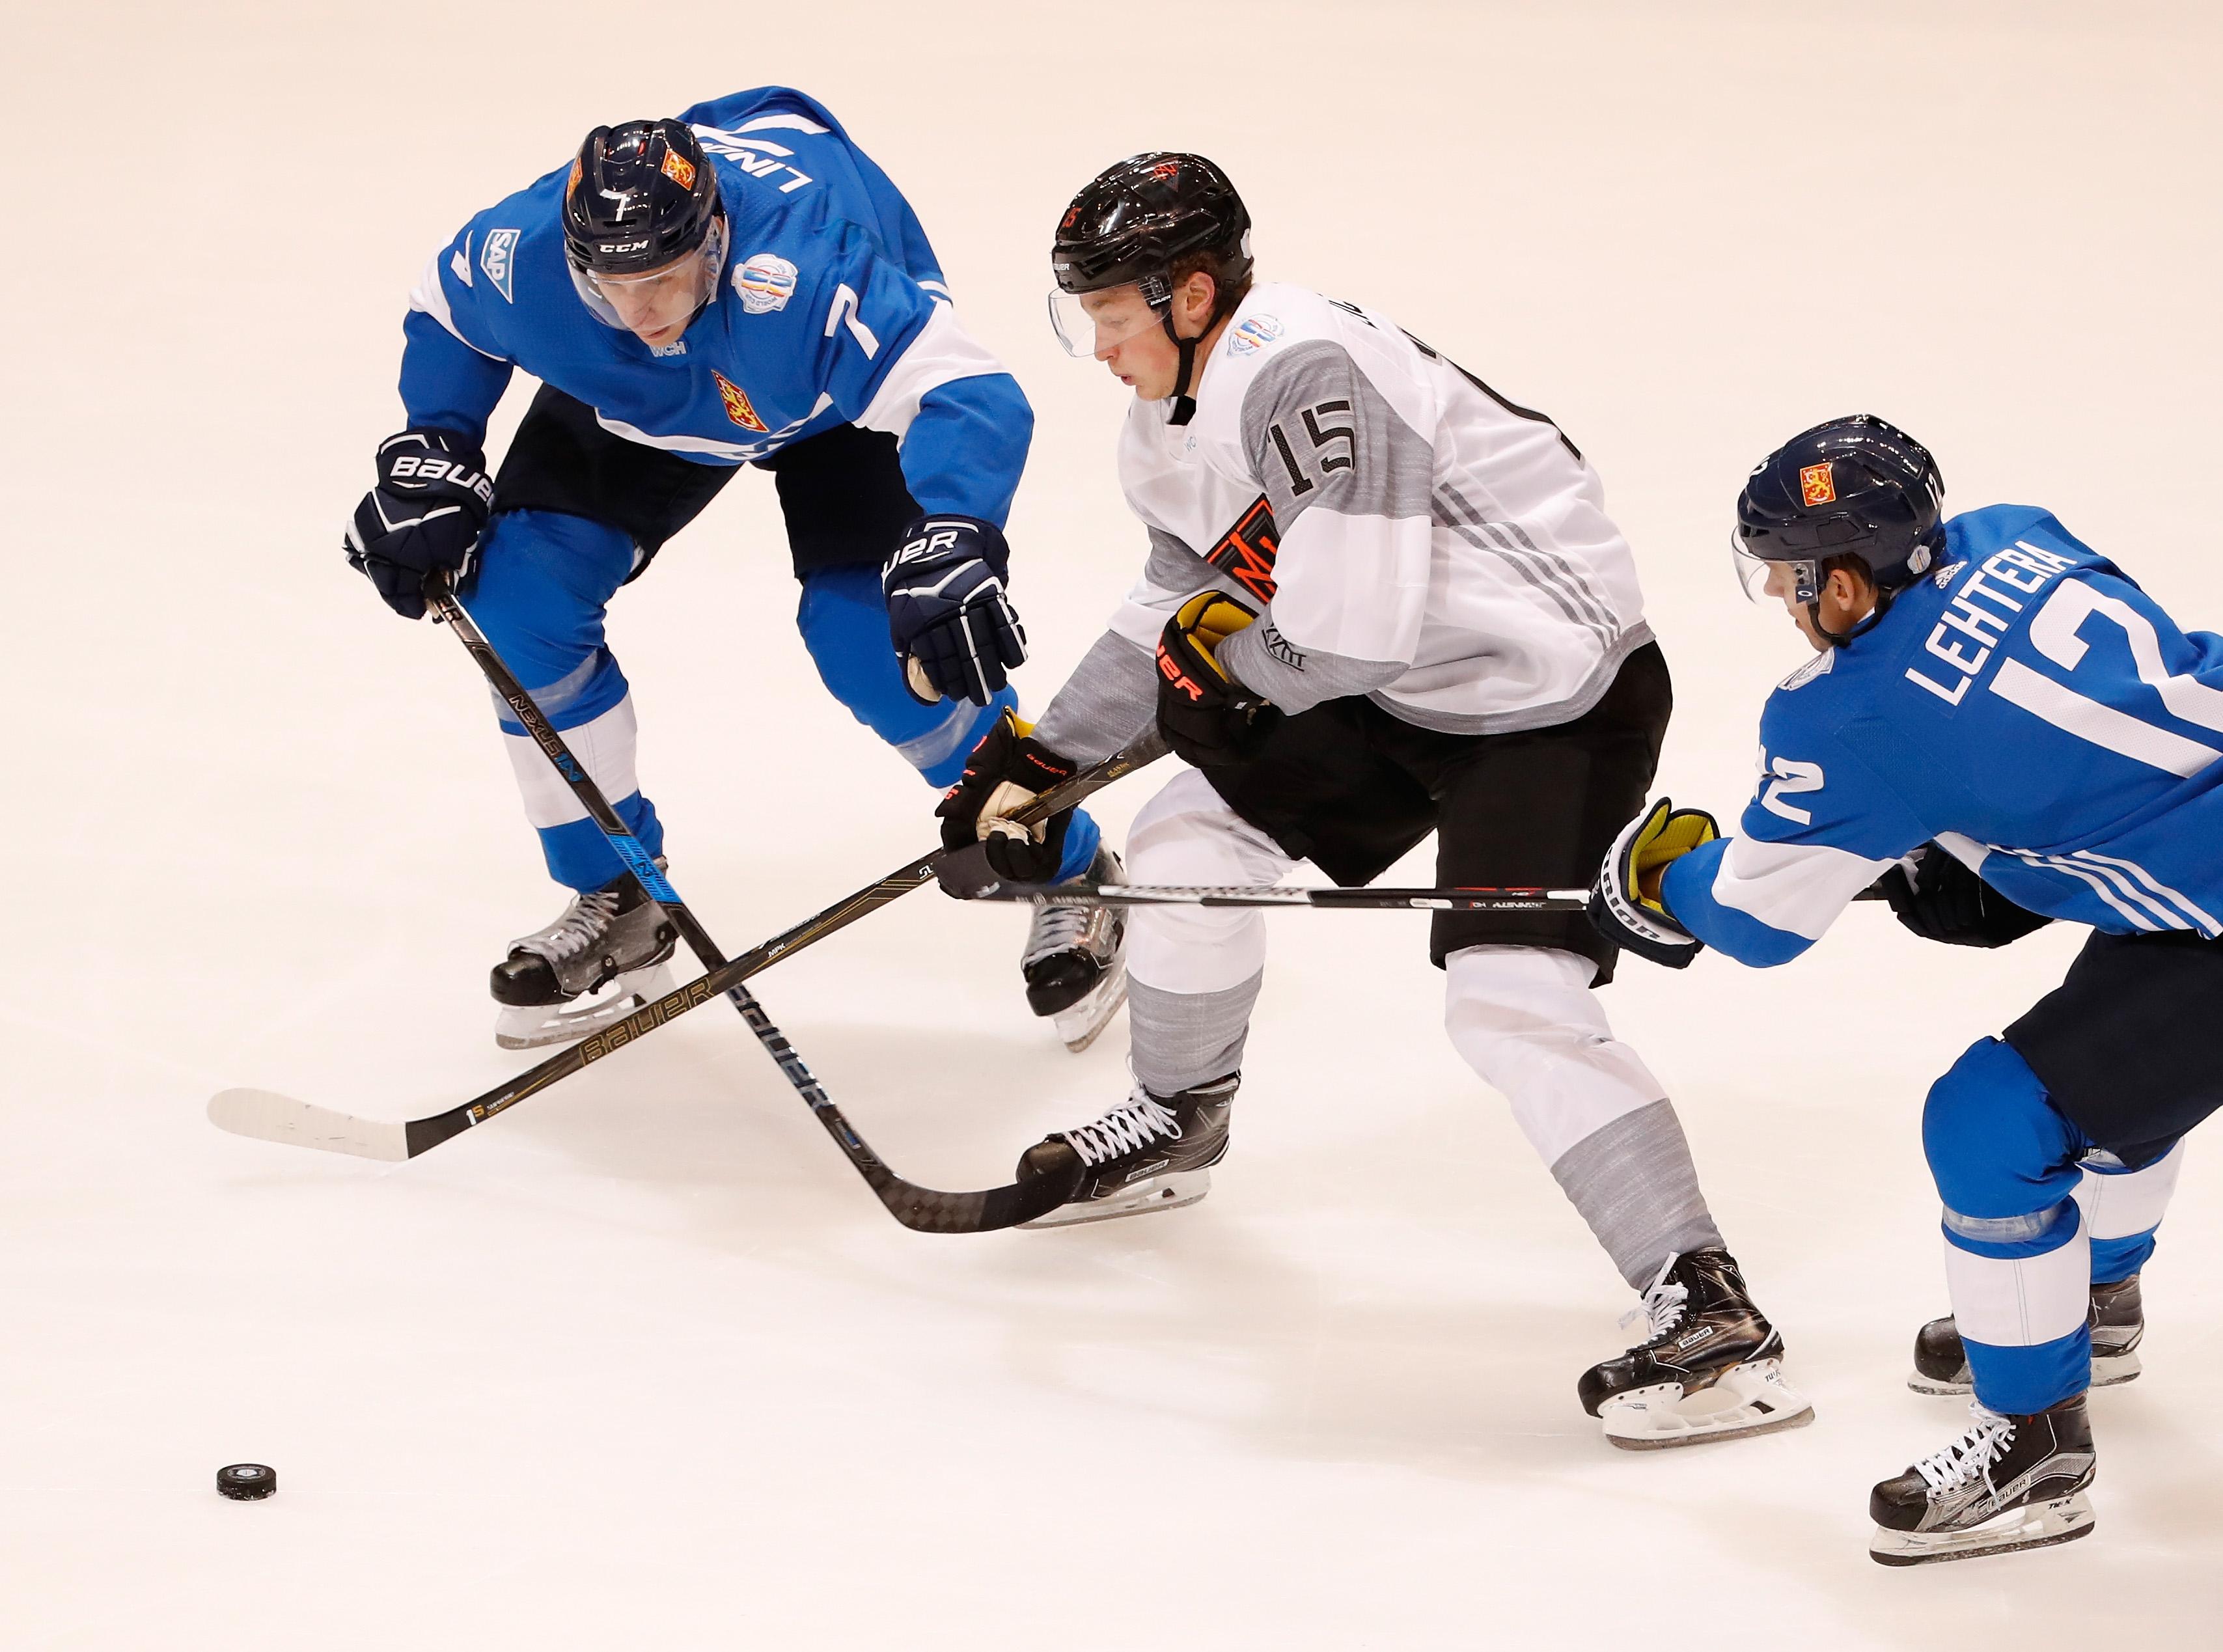 World Cup Of Hockey 2016 - Team North America v Findland